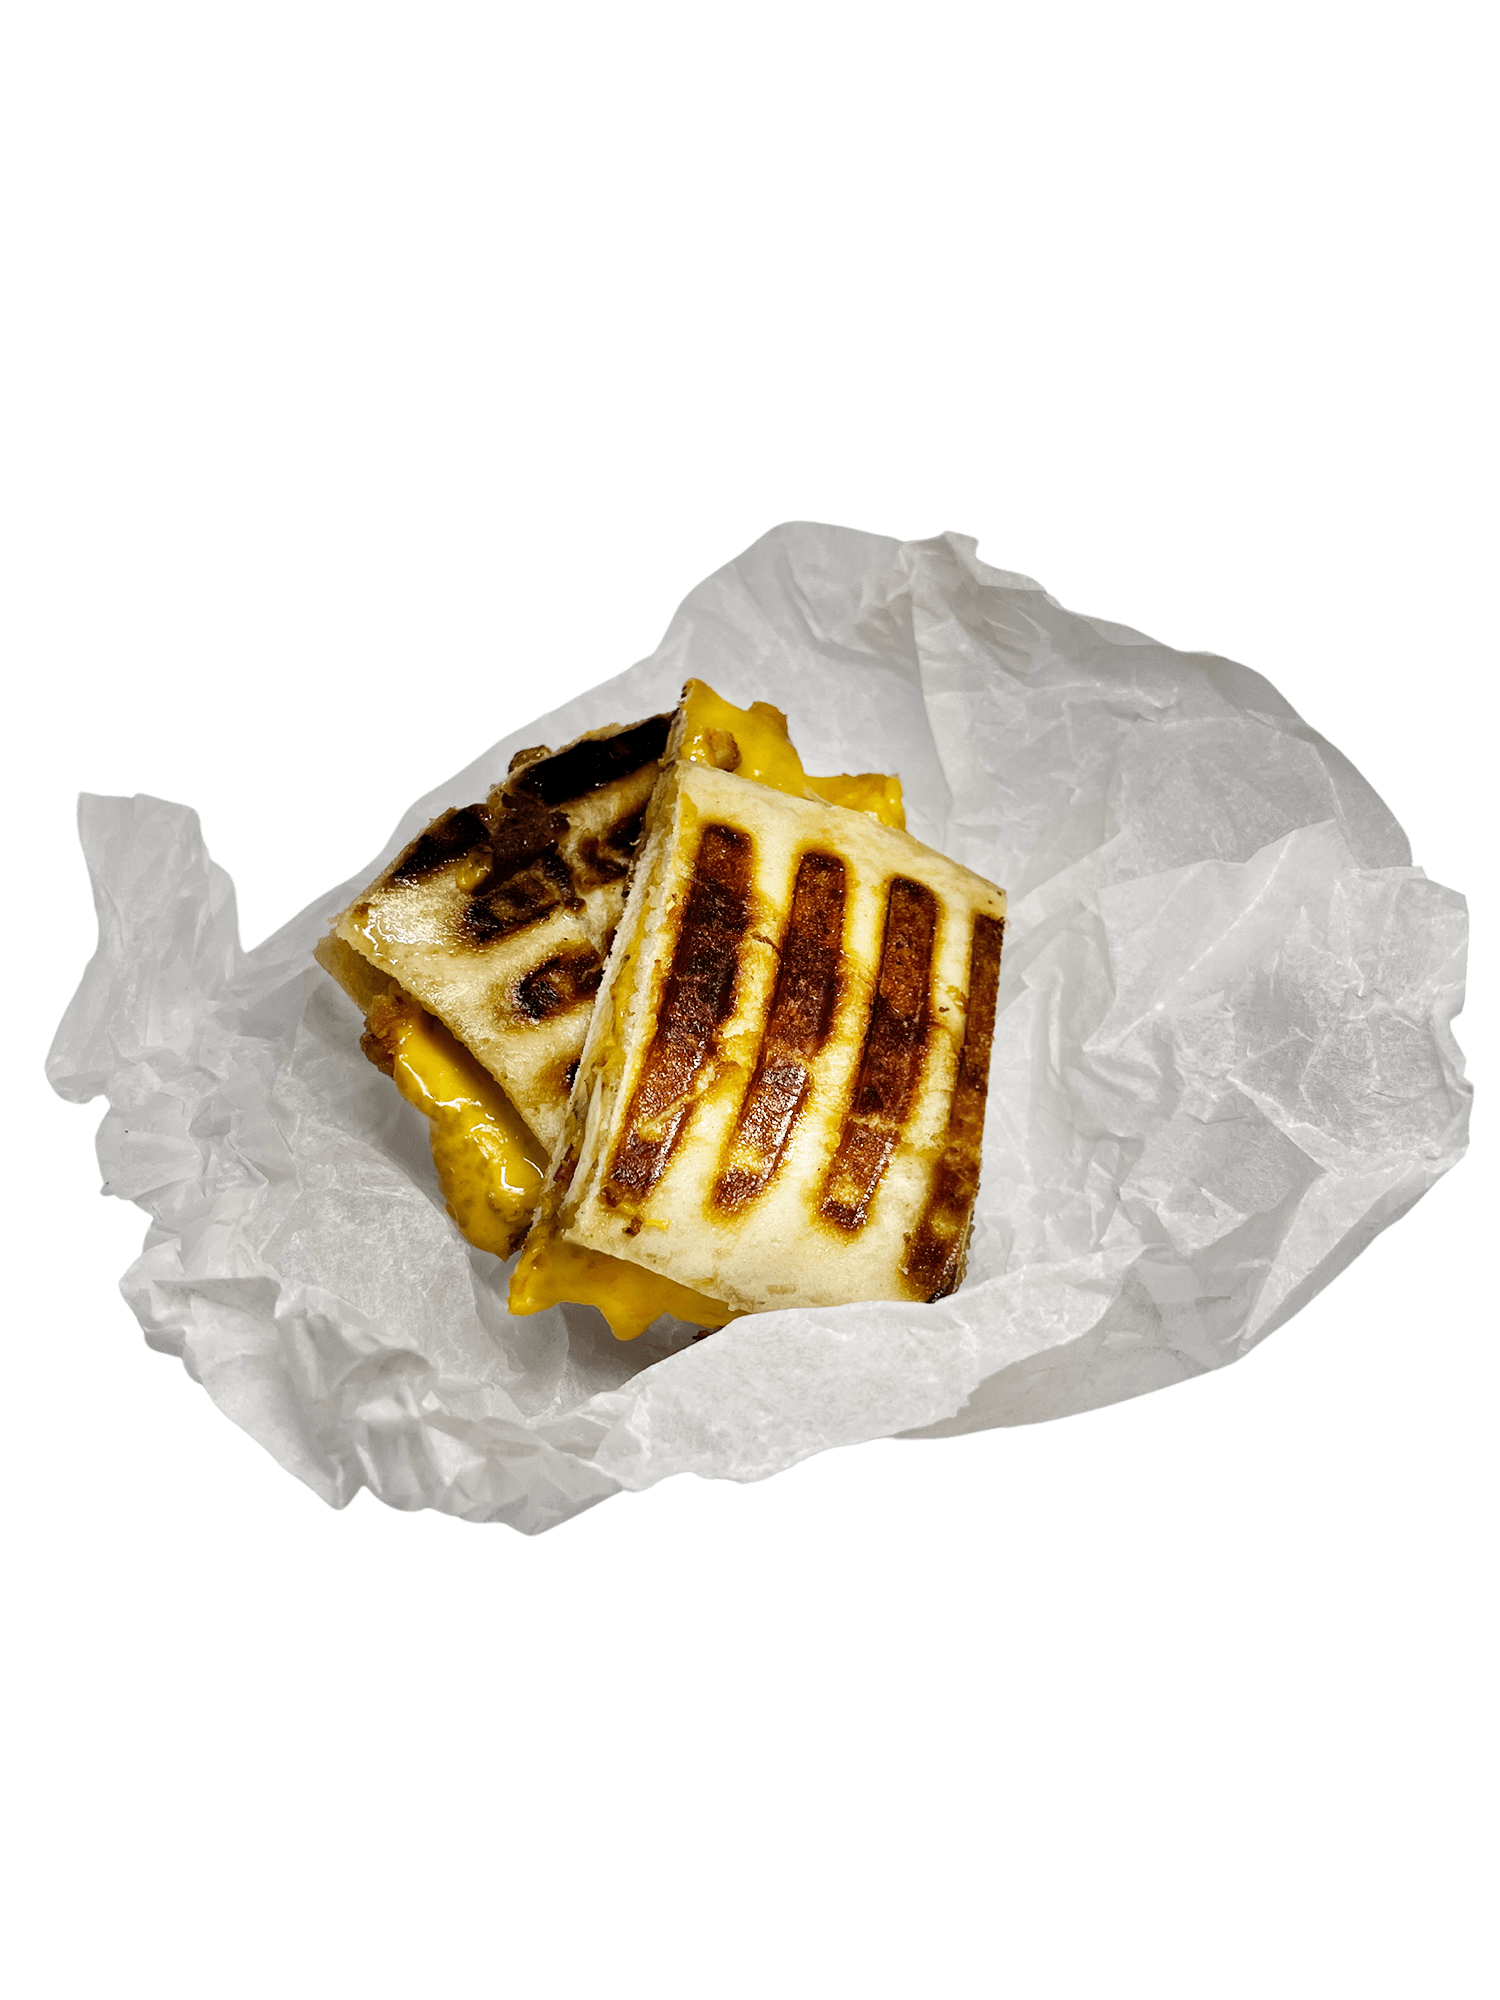 Kot Bano - cuban sandwich